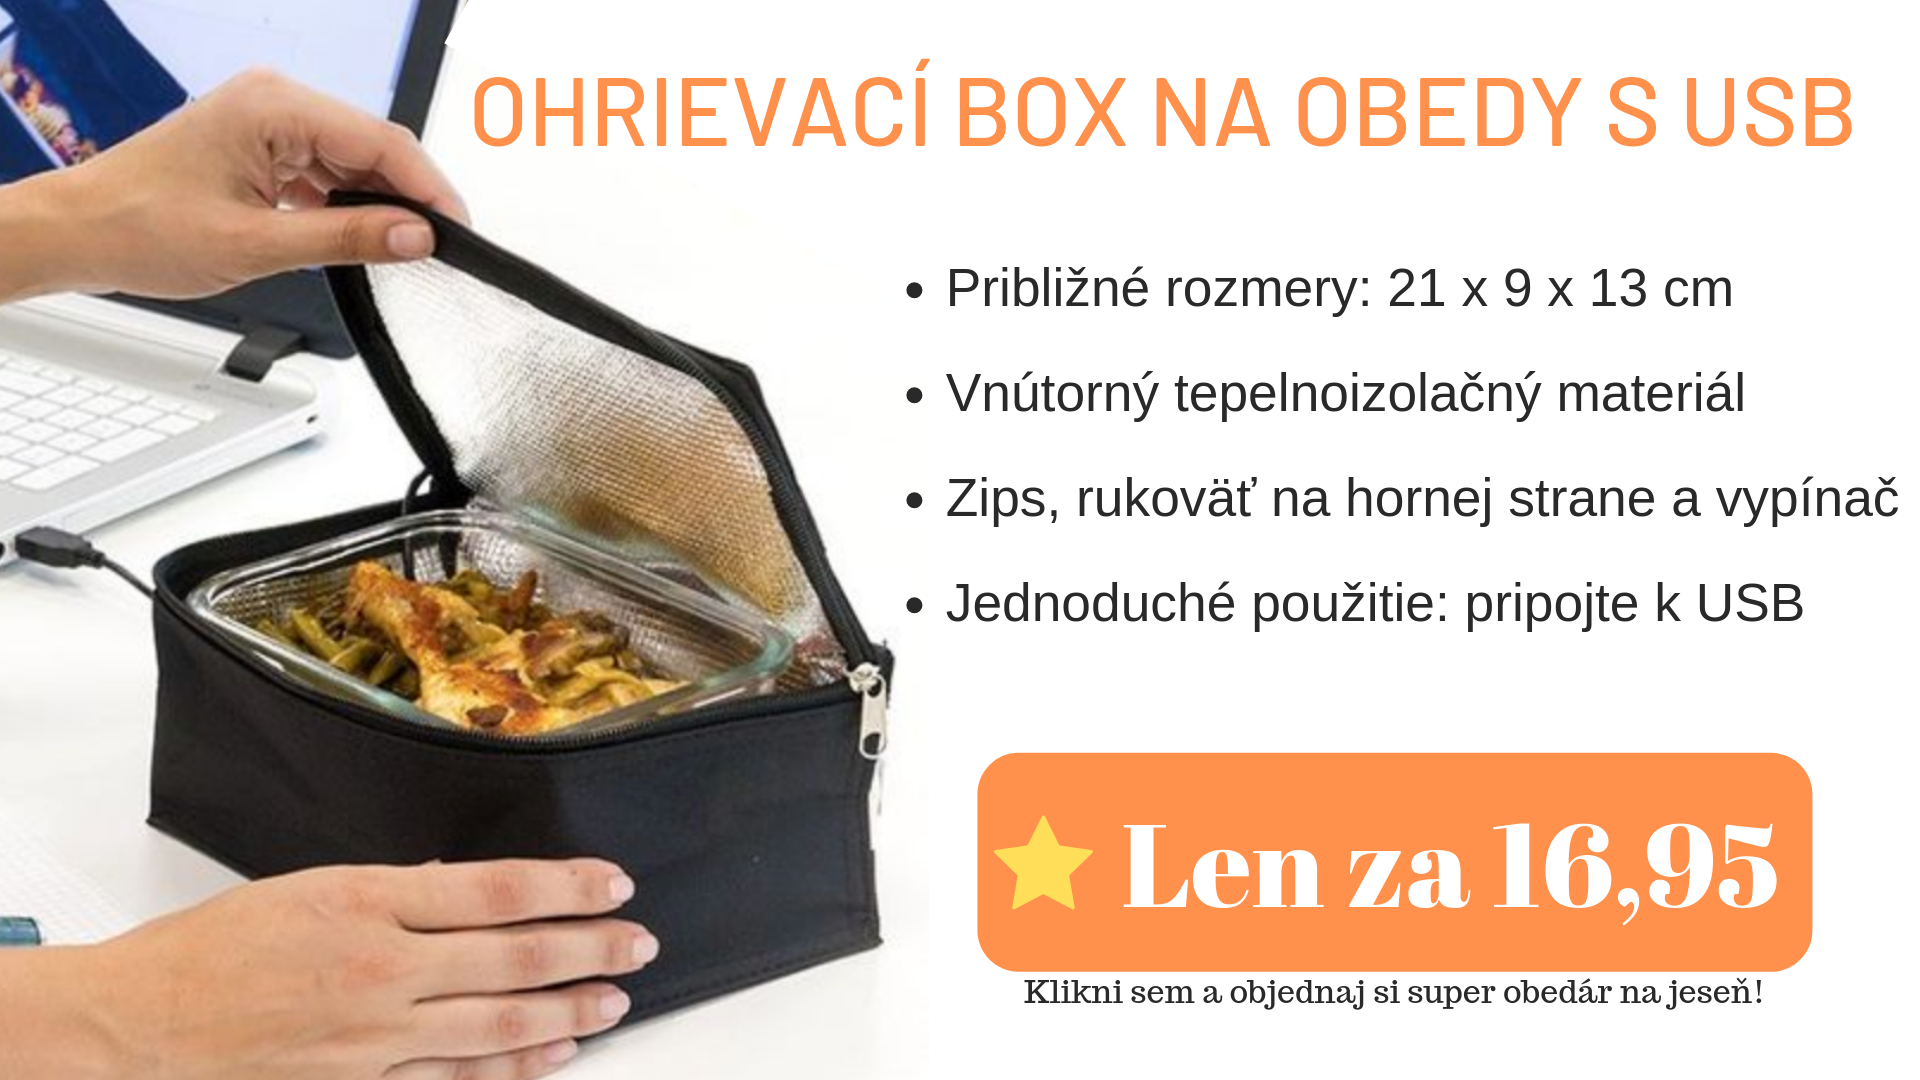 Ohrievací box na obedy s USB